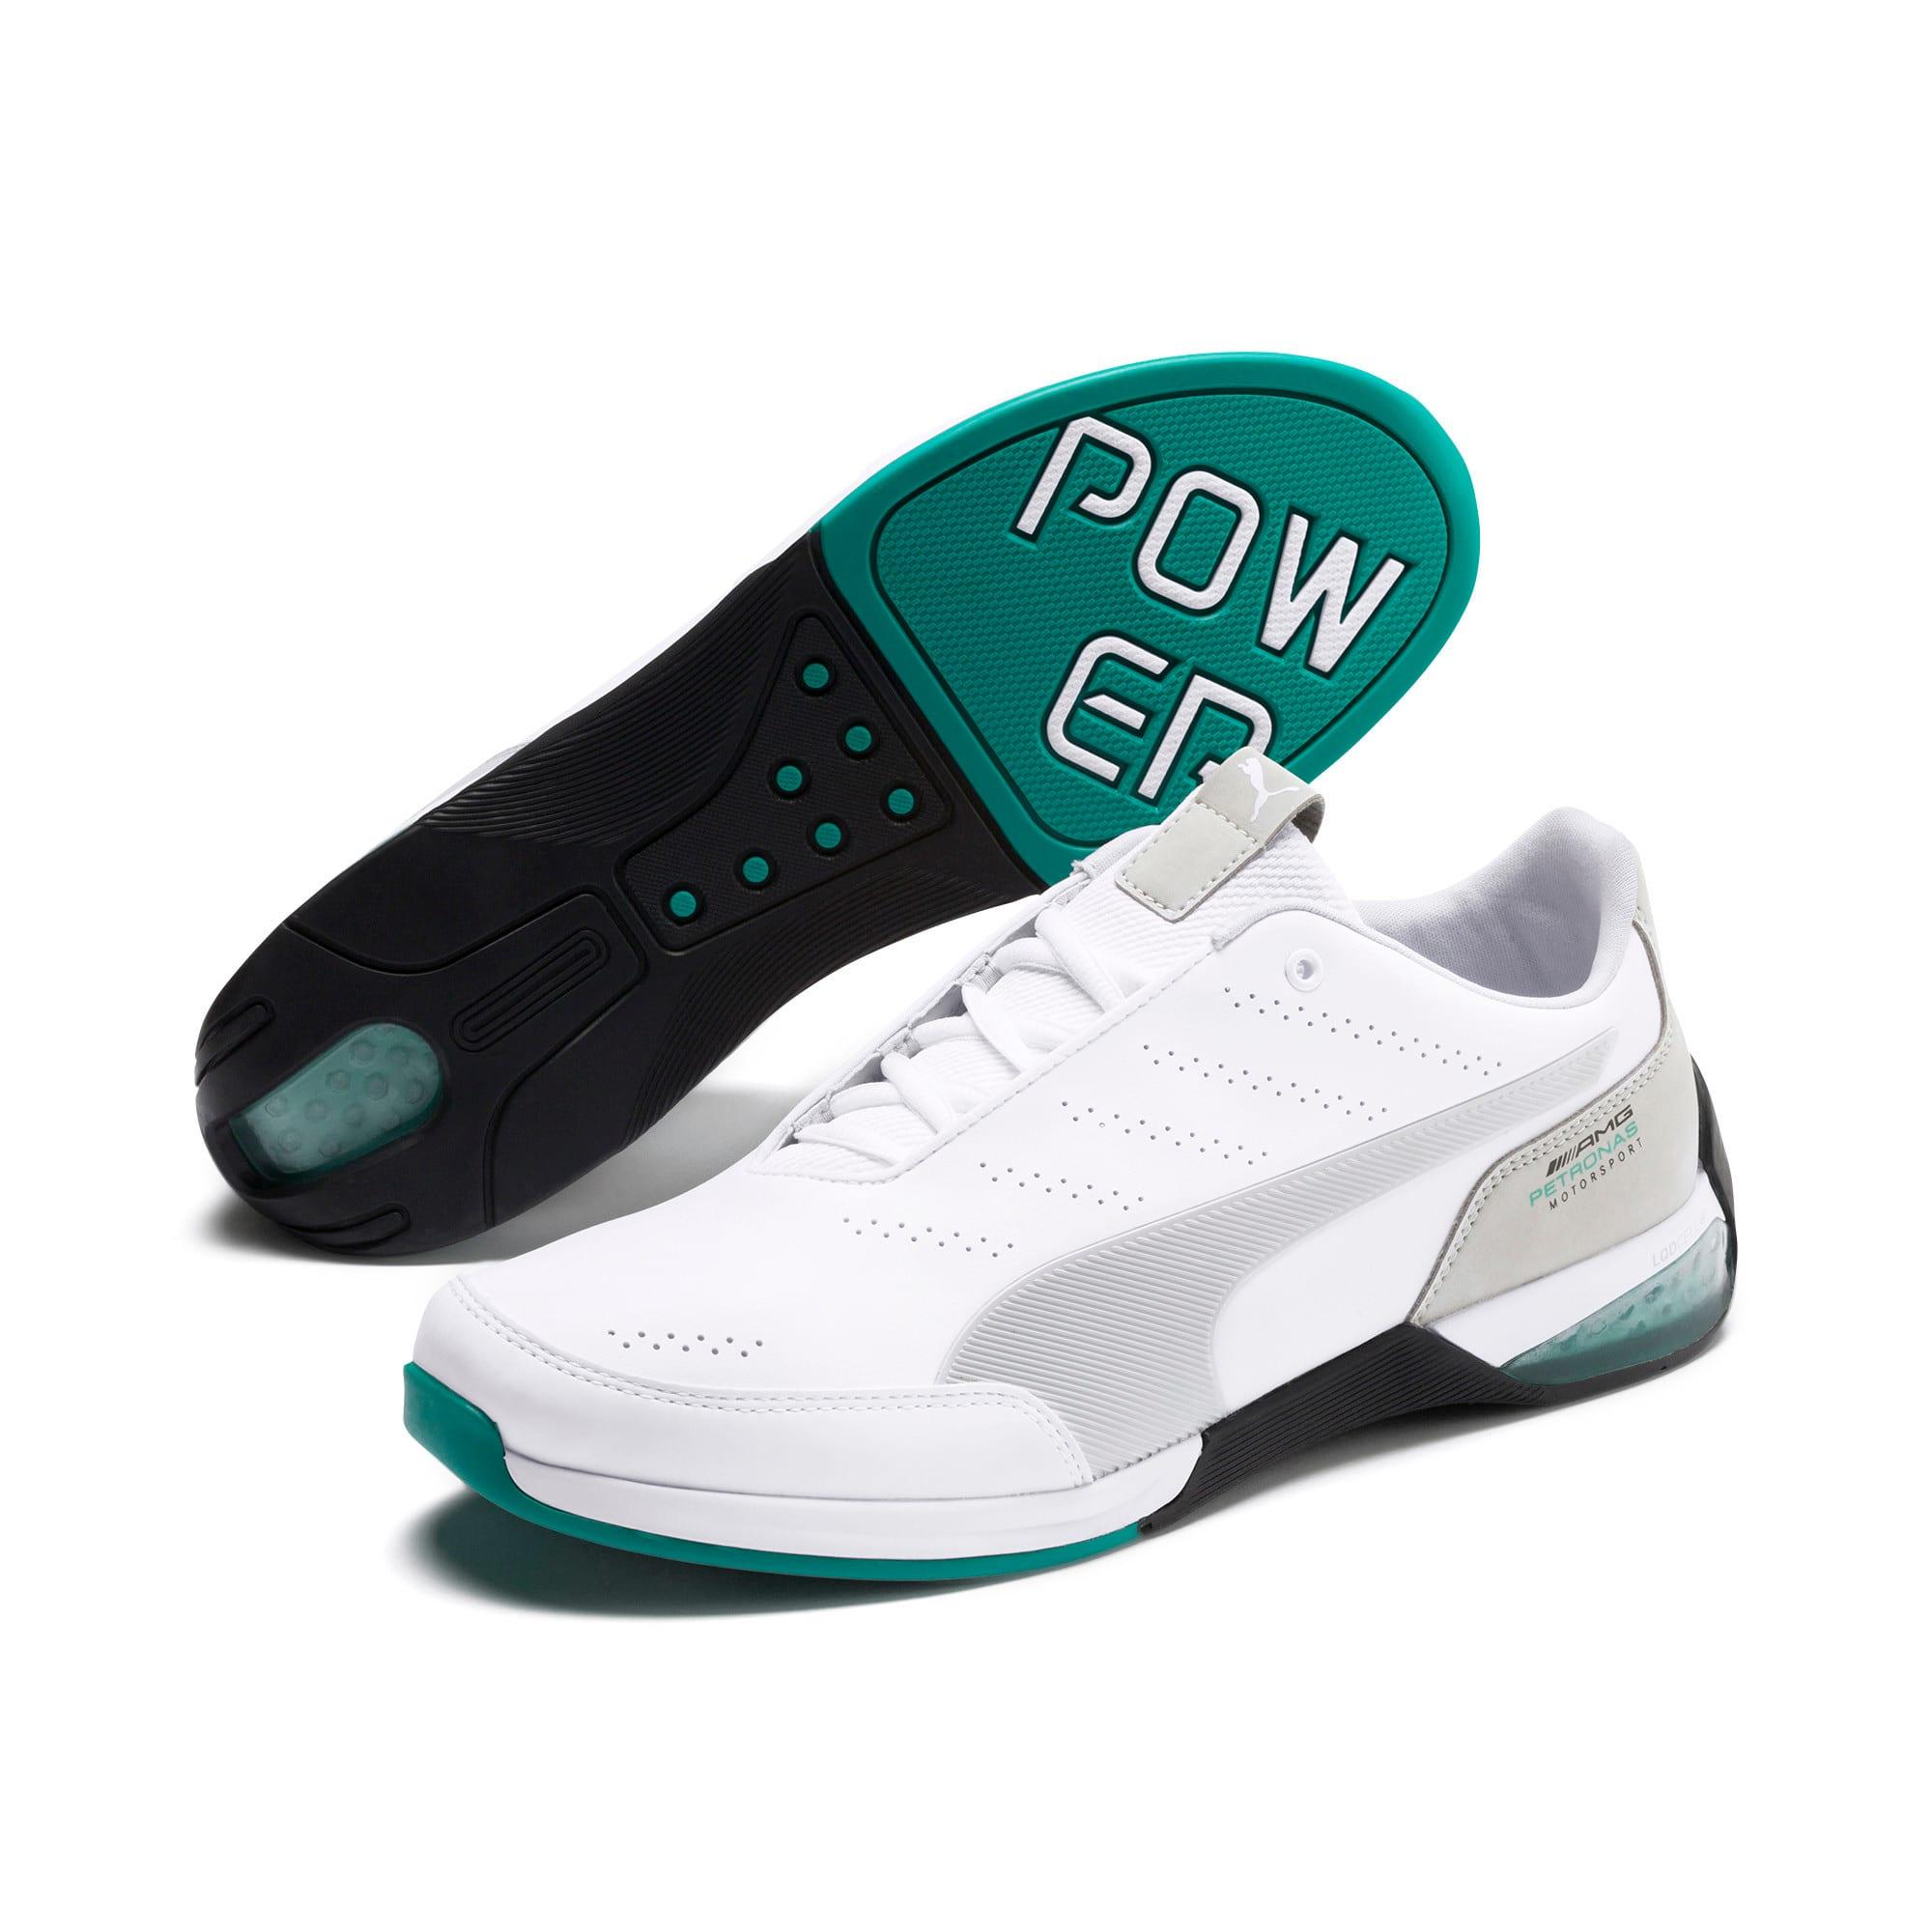 Thumbnail 3 of Mercedes AMG Petronas Kart Cat X Training Shoes, Puma White-Mercedes Silver, medium